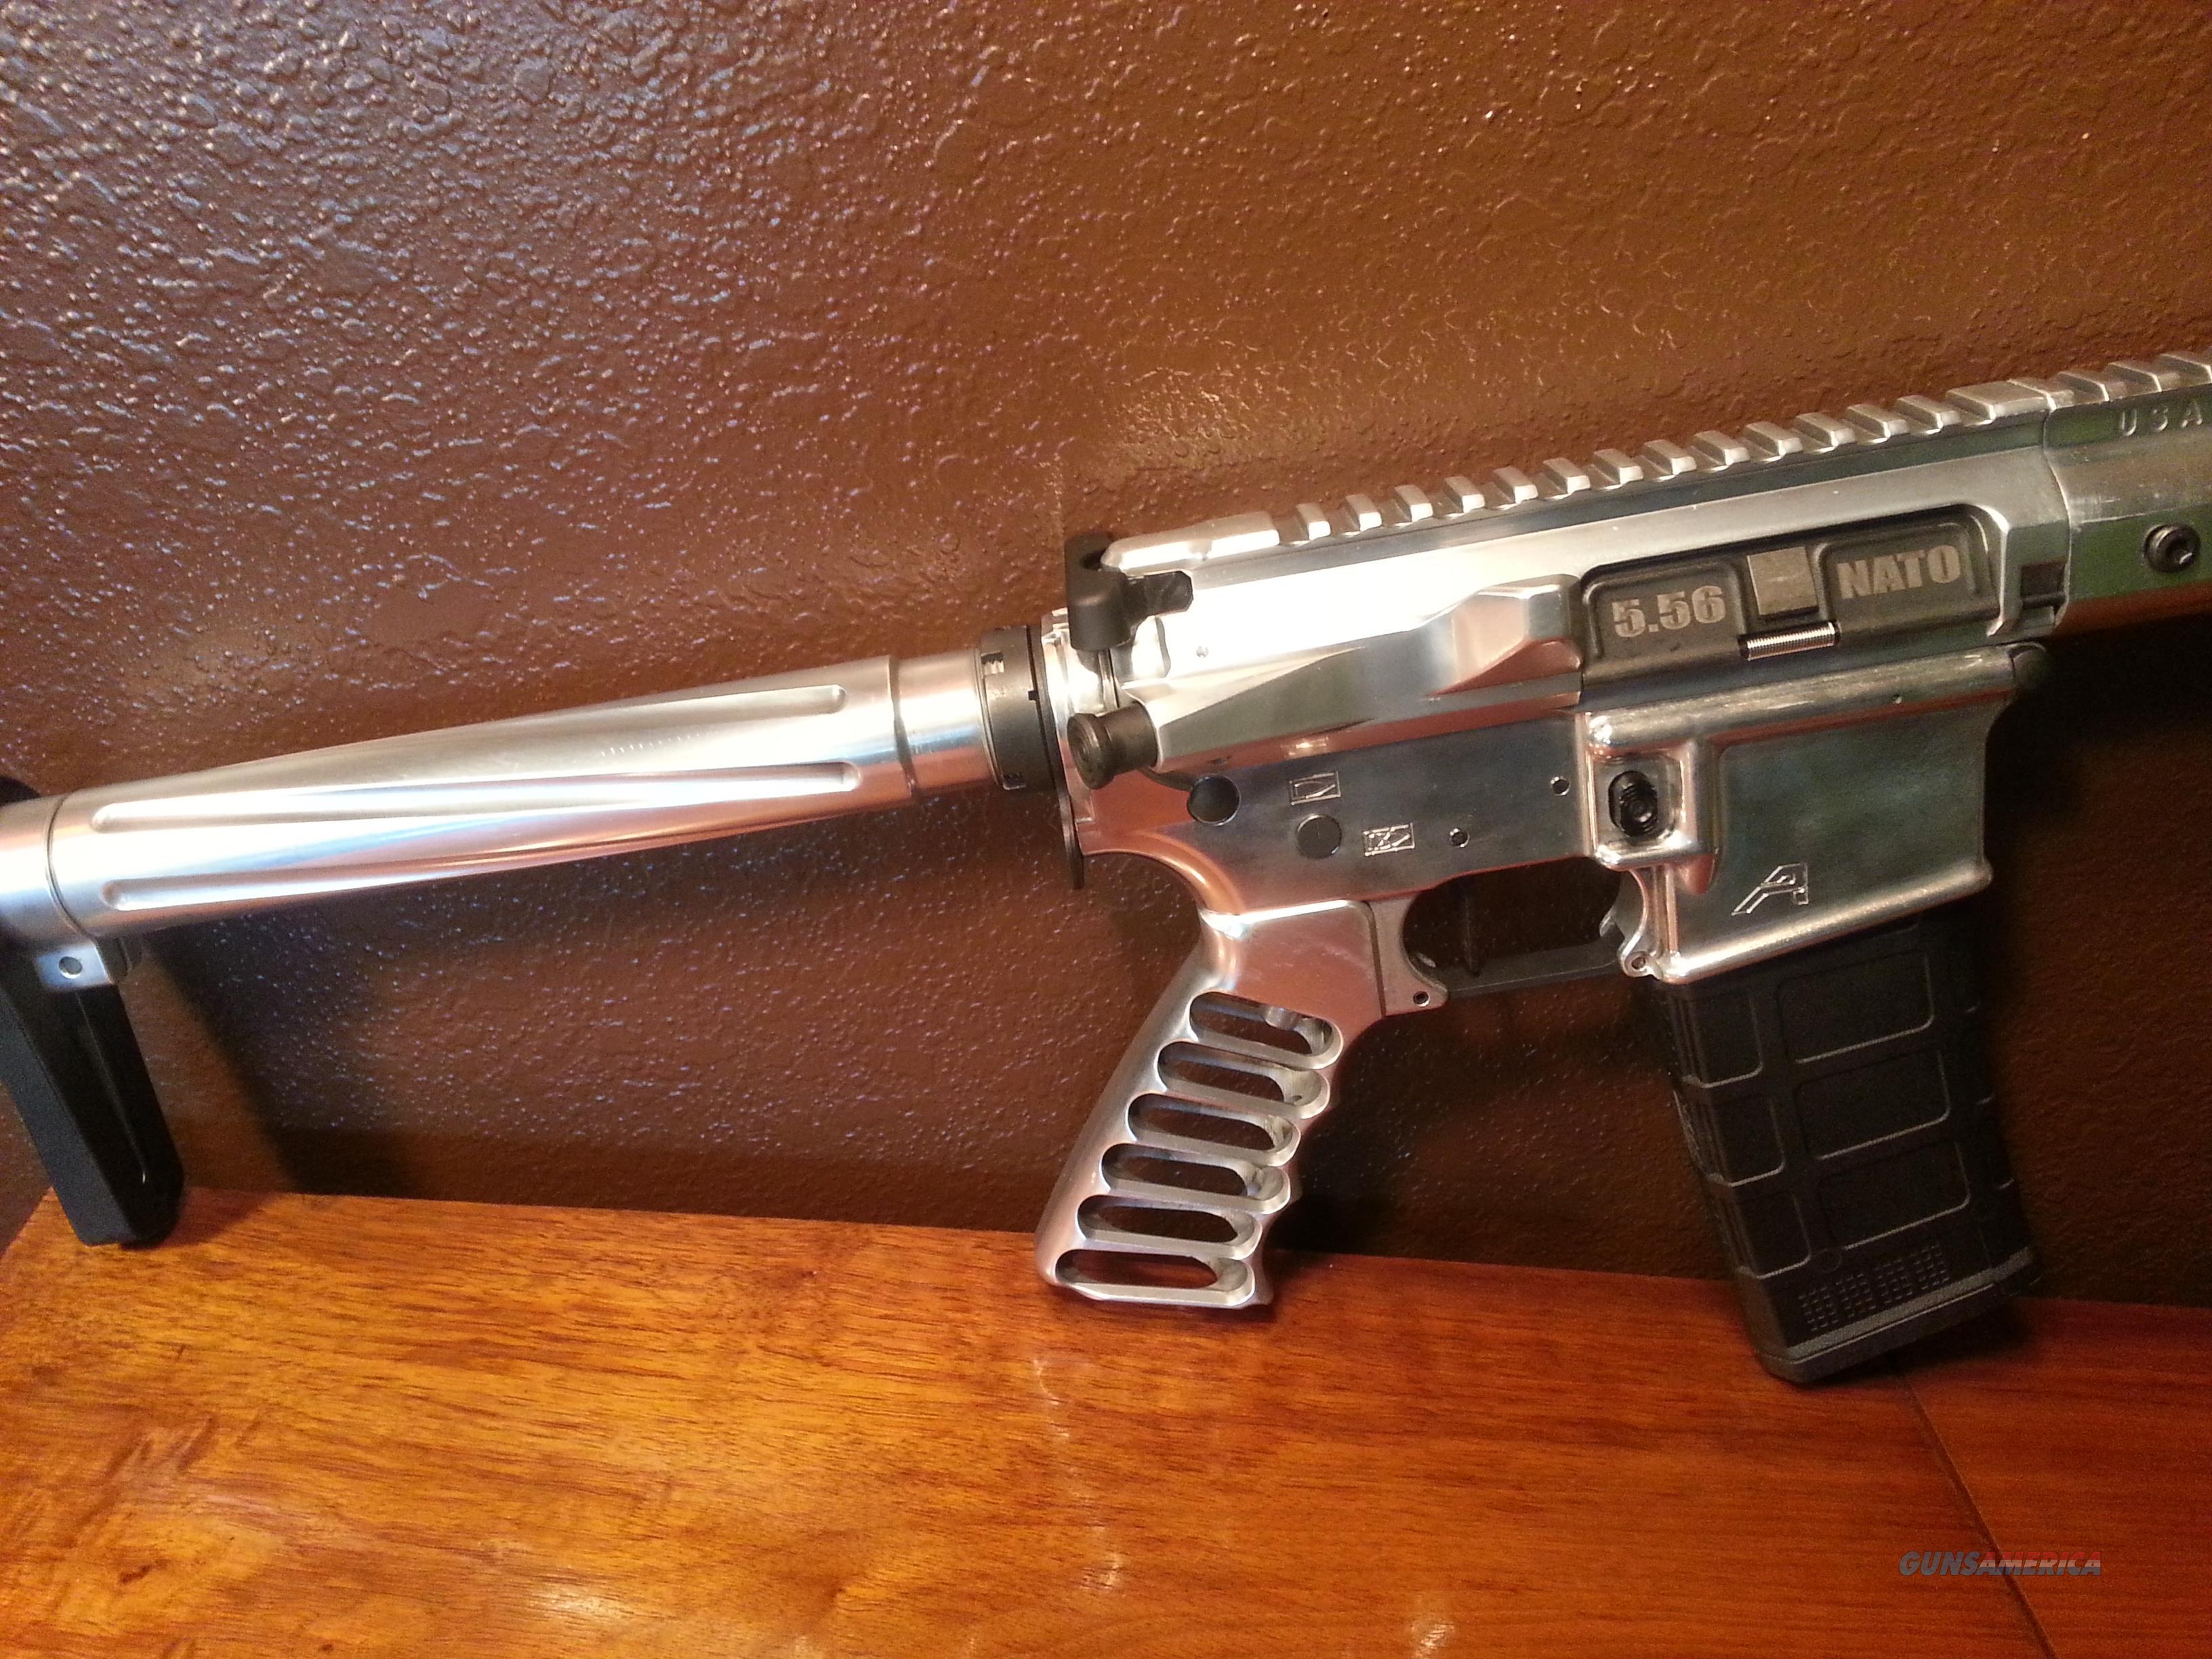 AR15 Aero Precision 5 56/223 Custom AR 15 All Polished Alum  Timney  Trigger, Nickle Boron BCG 16